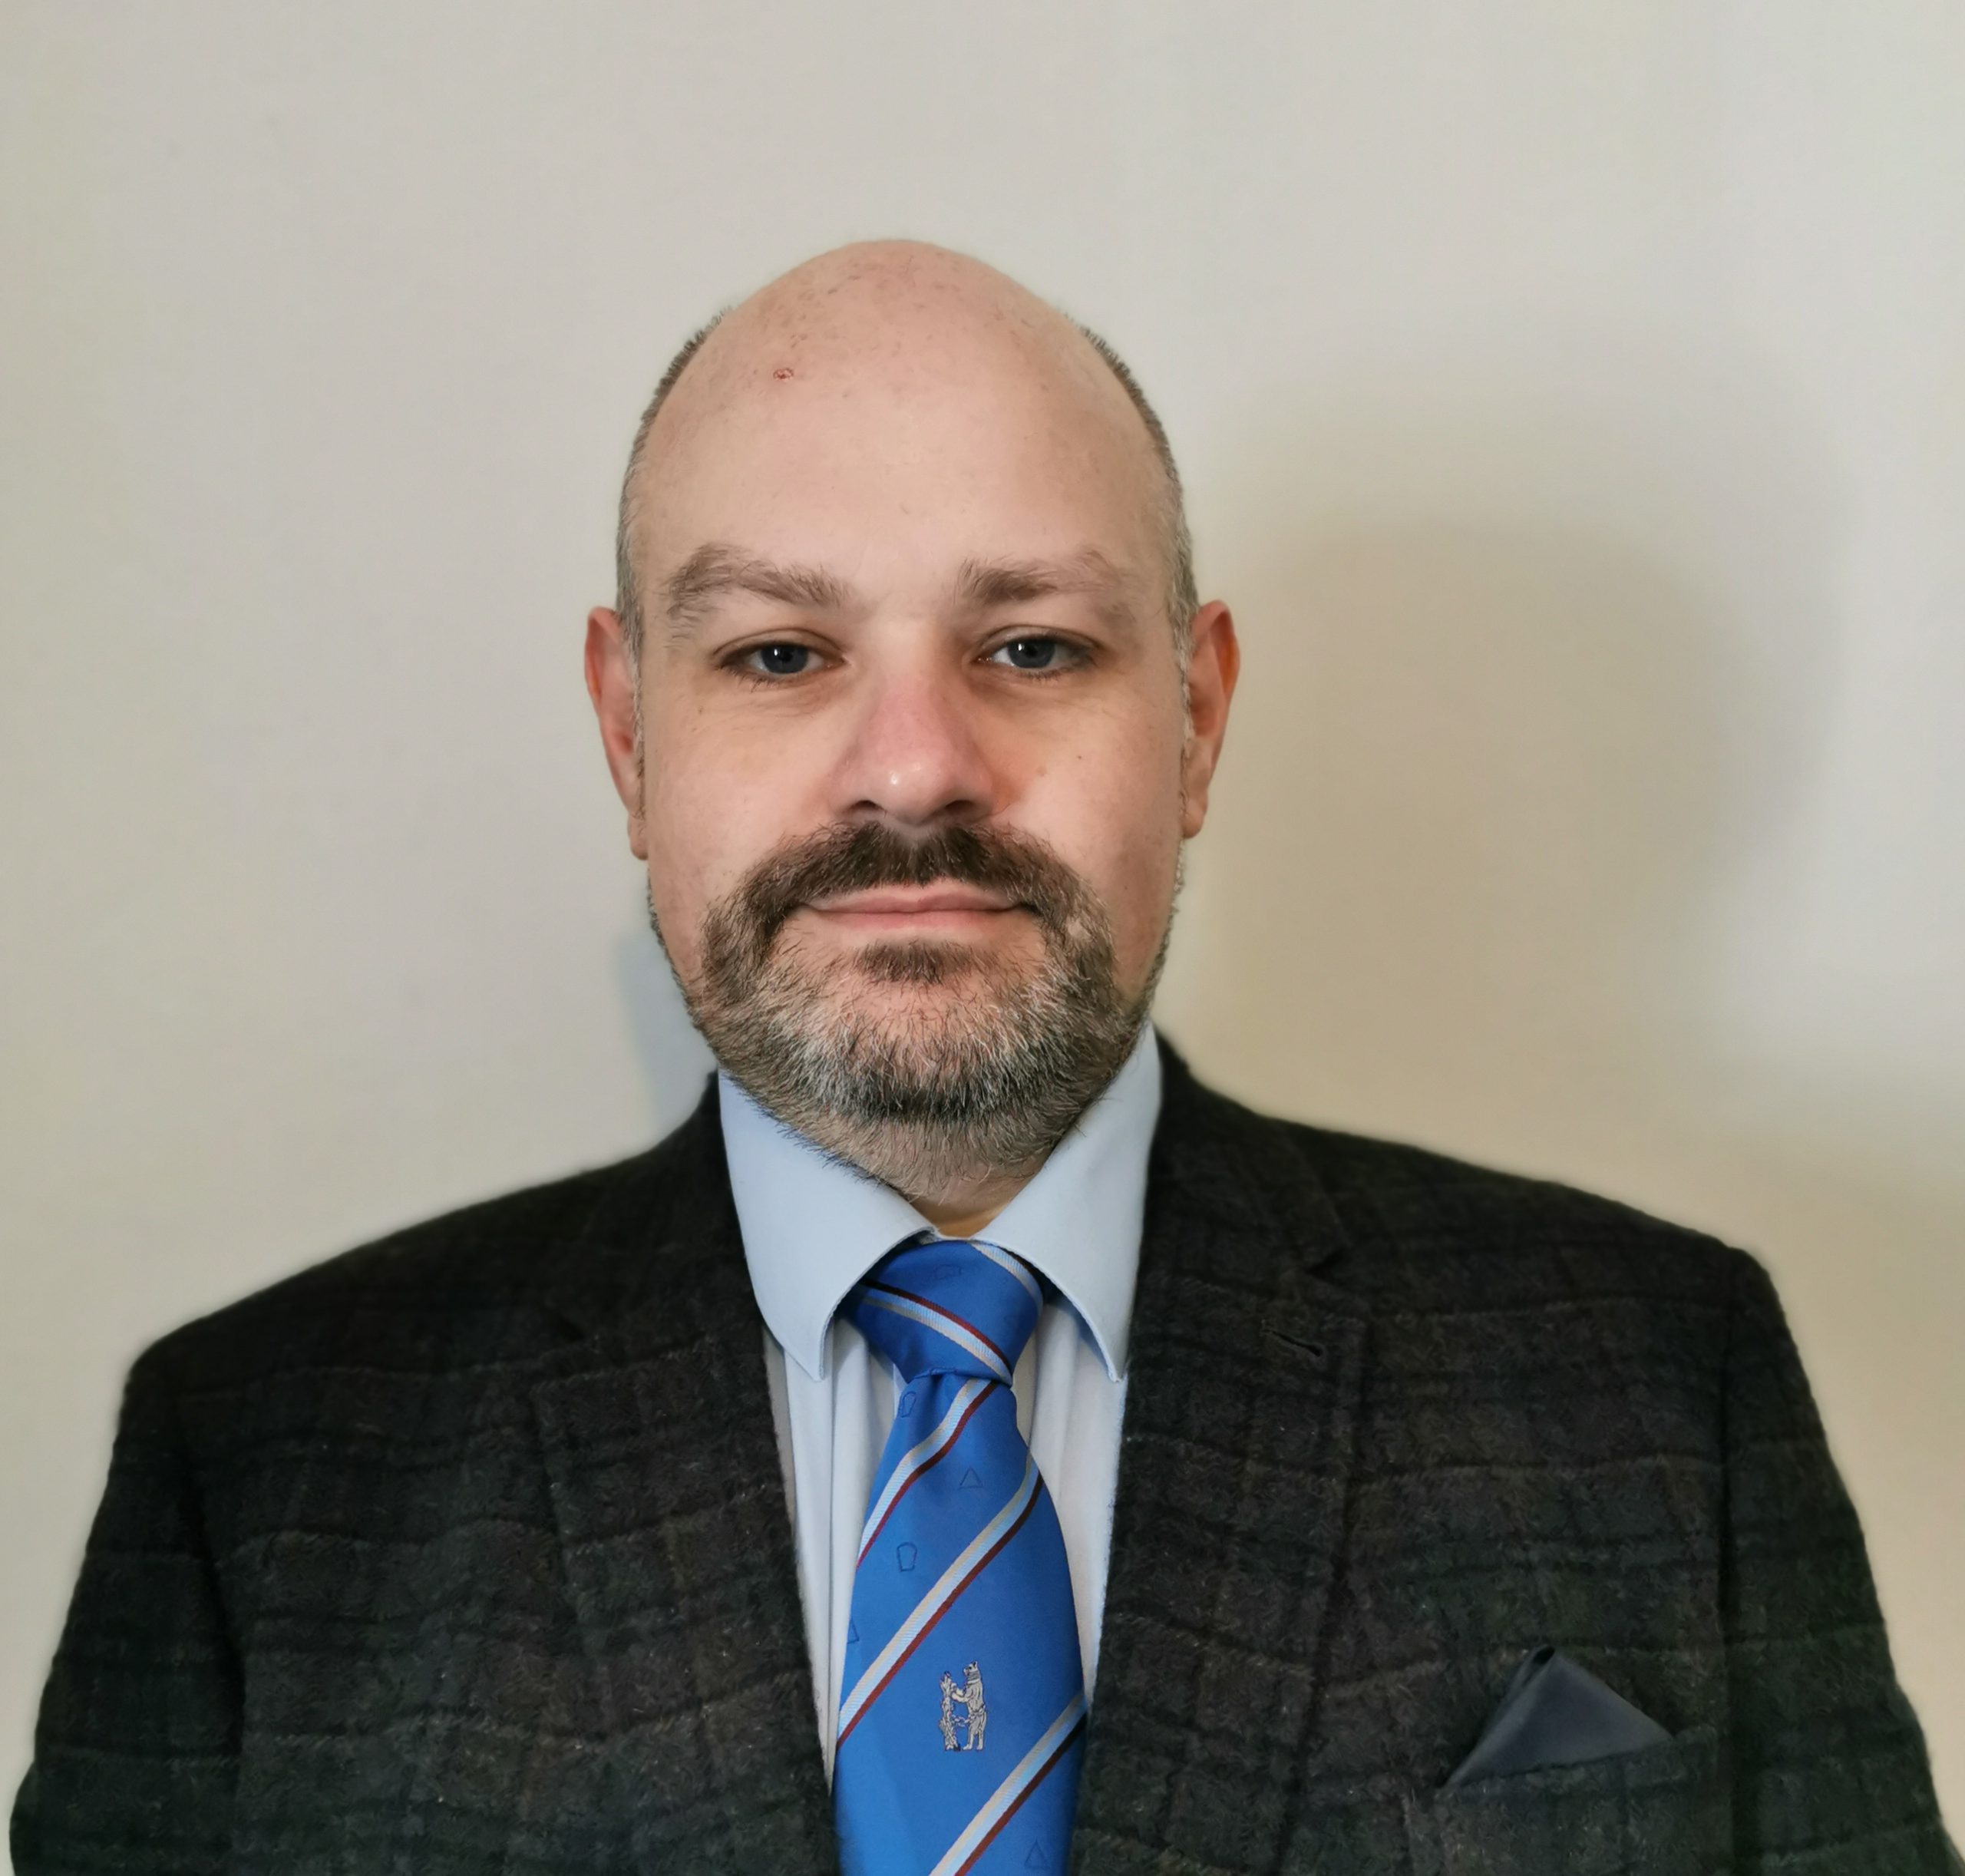 David Ursell